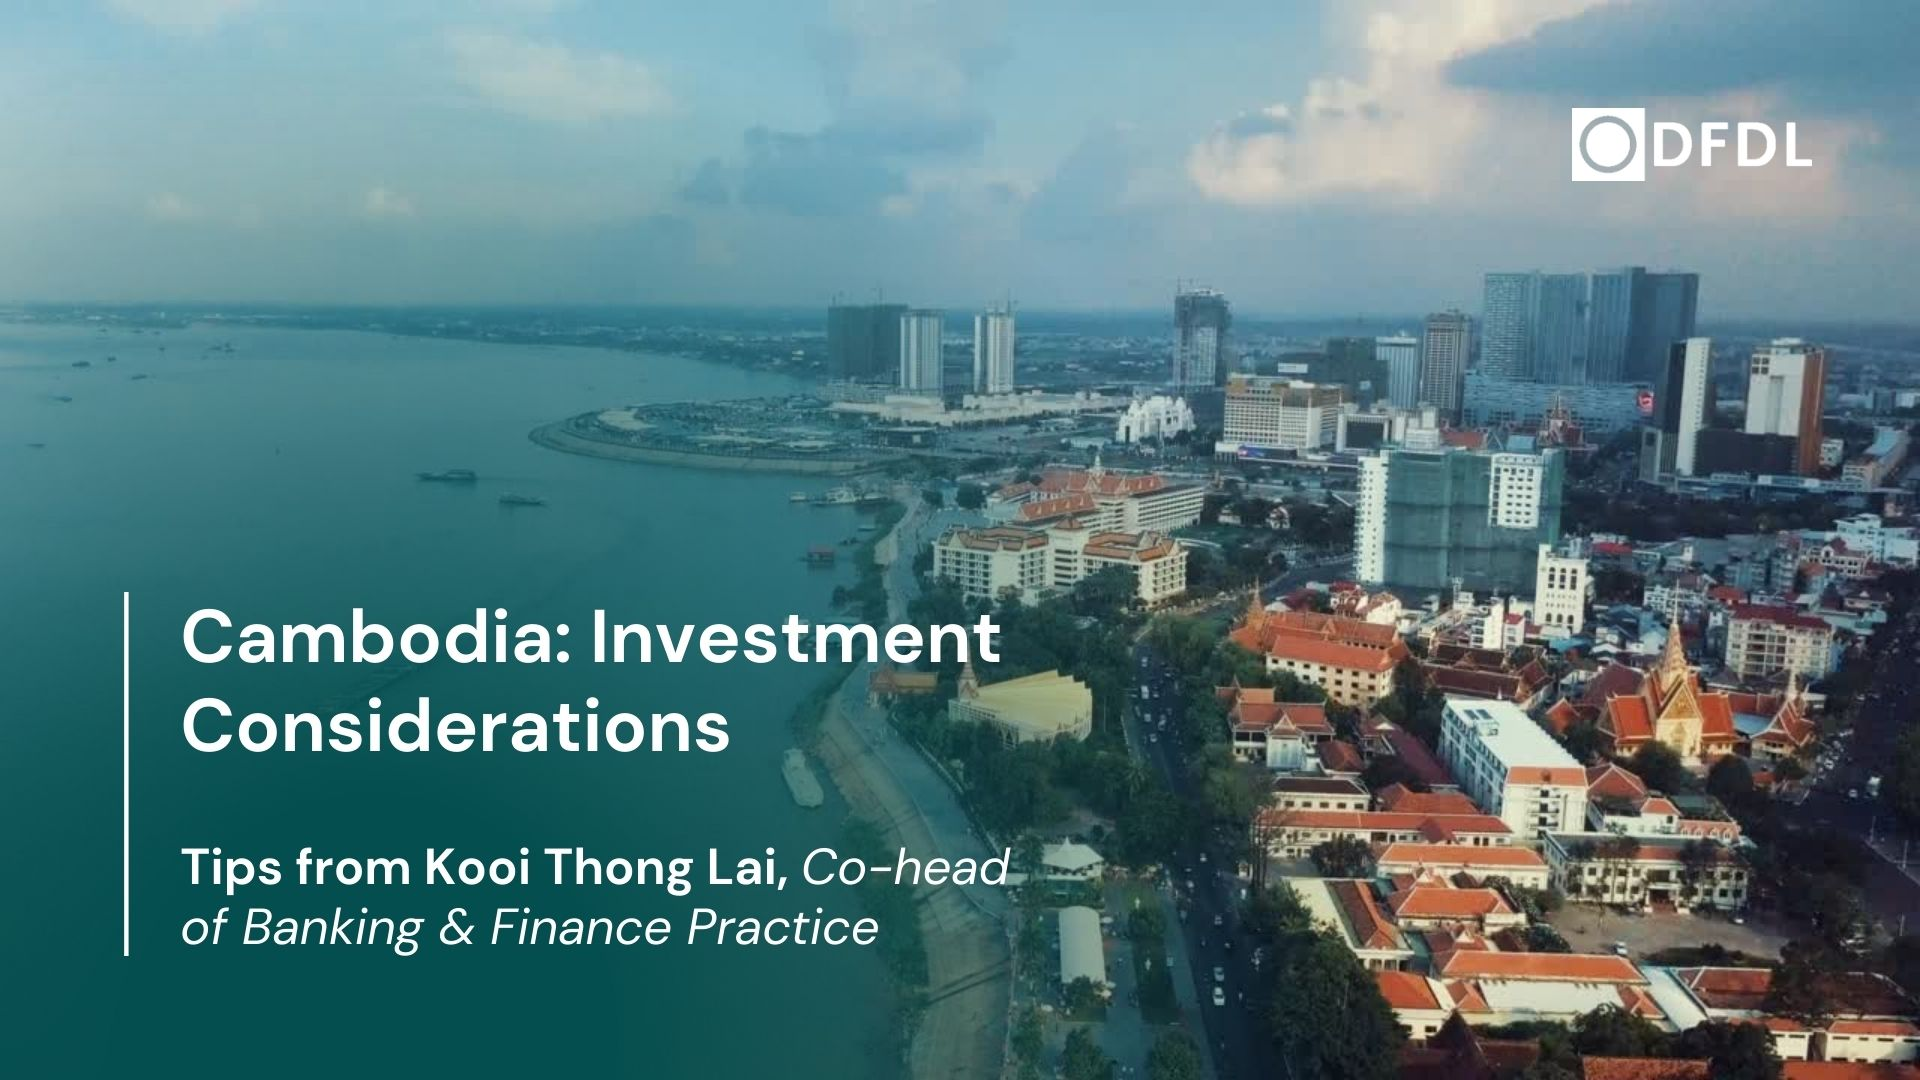 Cambodia: Investment Considerations